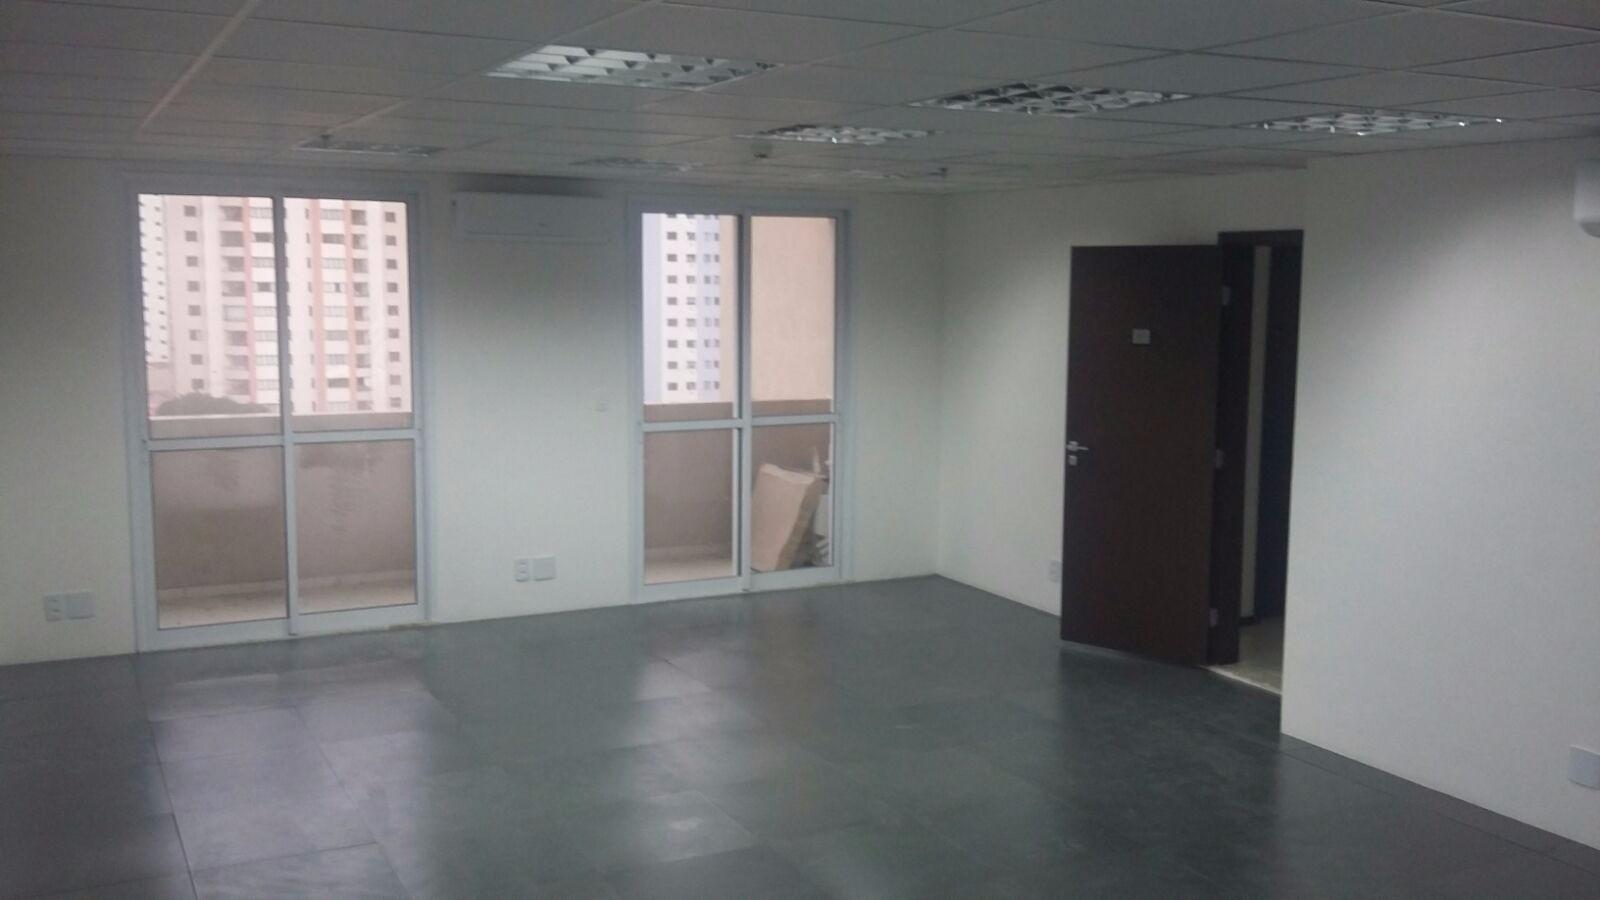 comprar ou alugar sala no bairro ipiranga na cidade de sao paulo-sp